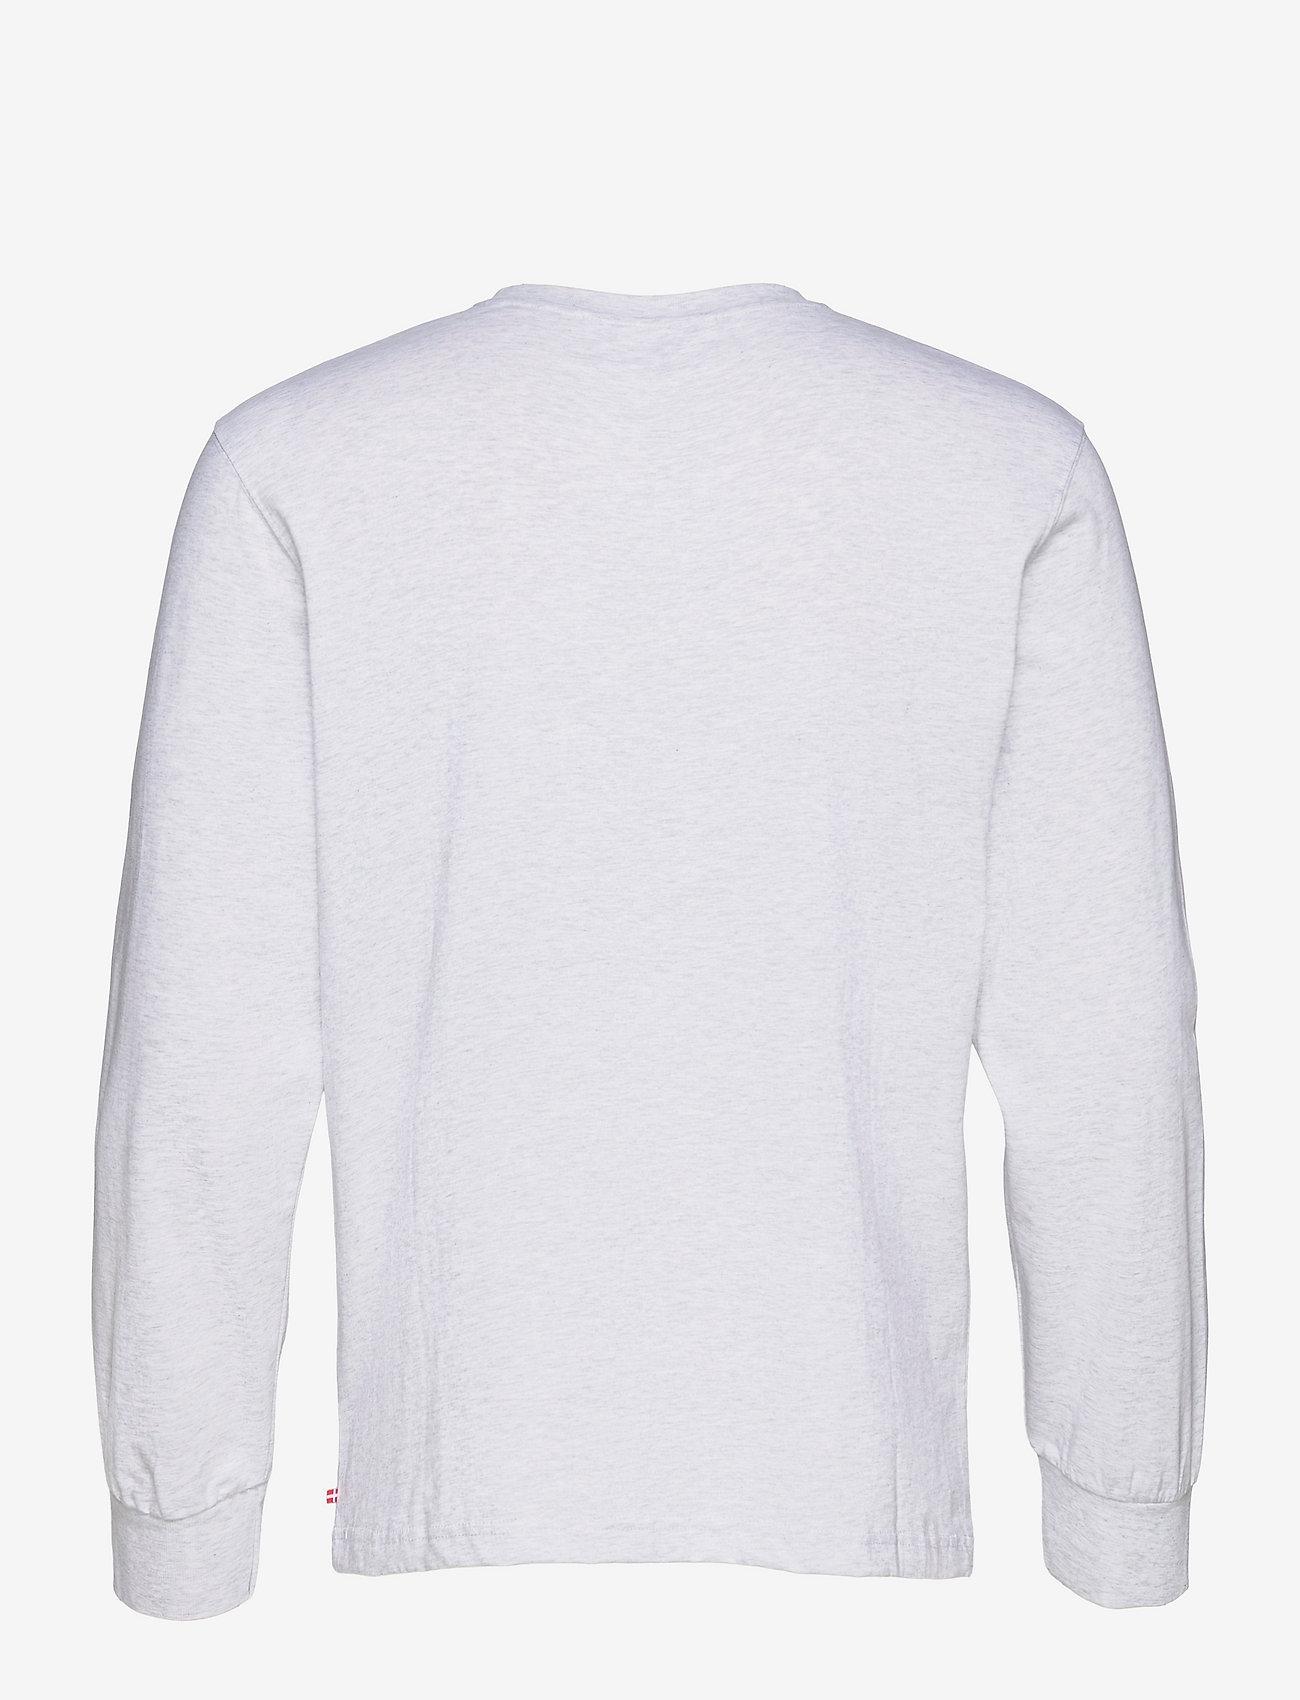 HAN Kjøbenhavn - Casual Tee Long Sleeve - basic t-shirts - light grey melange logo - 1